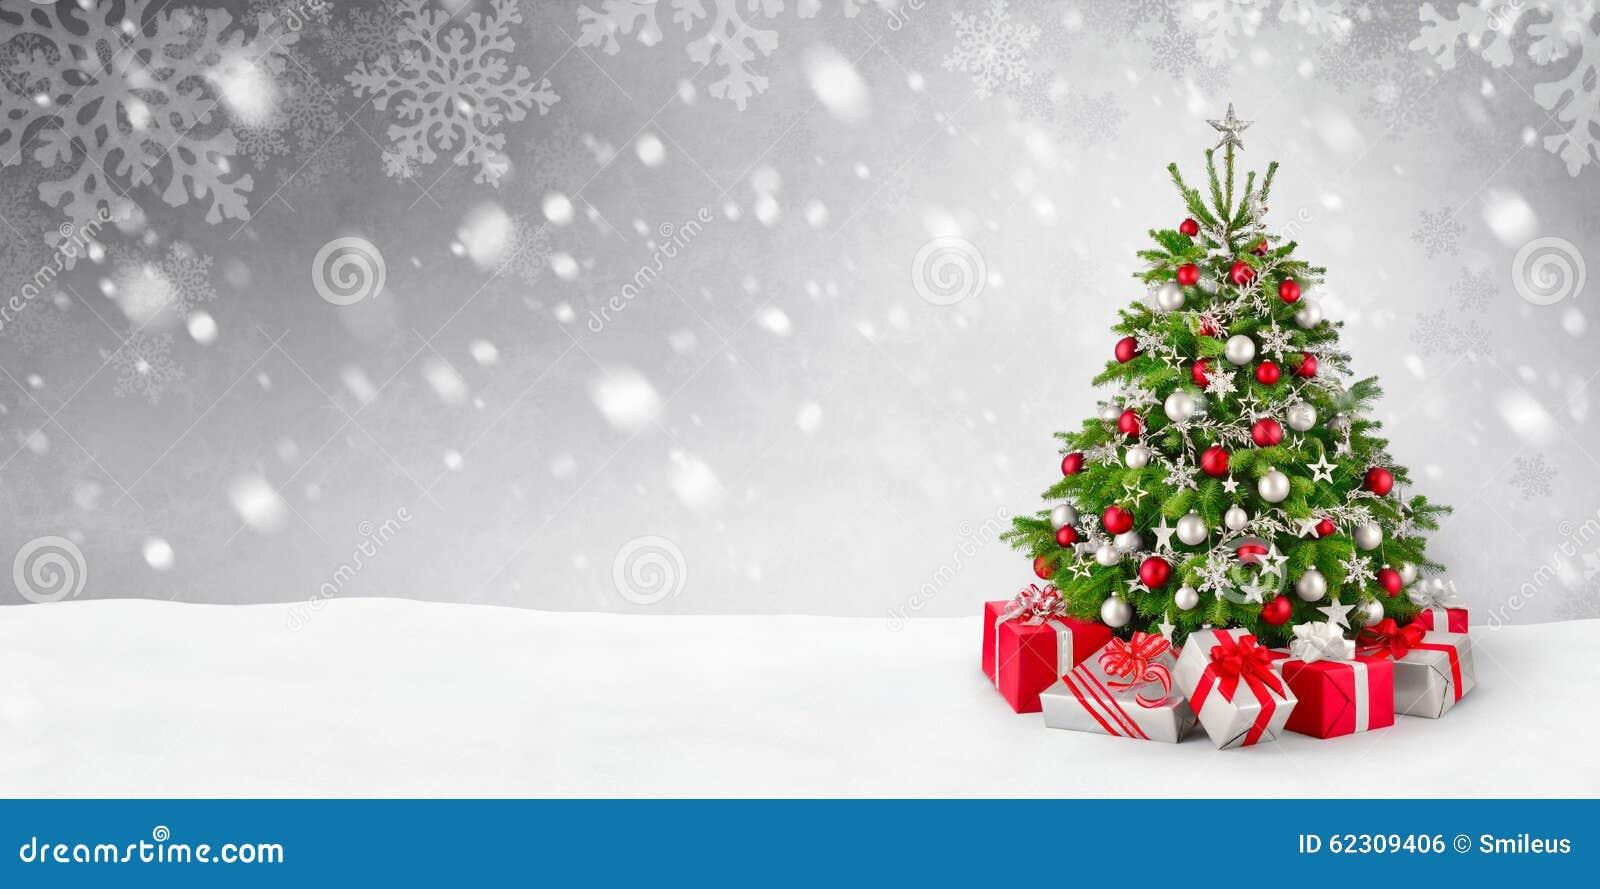 Christmas Tree Snowing